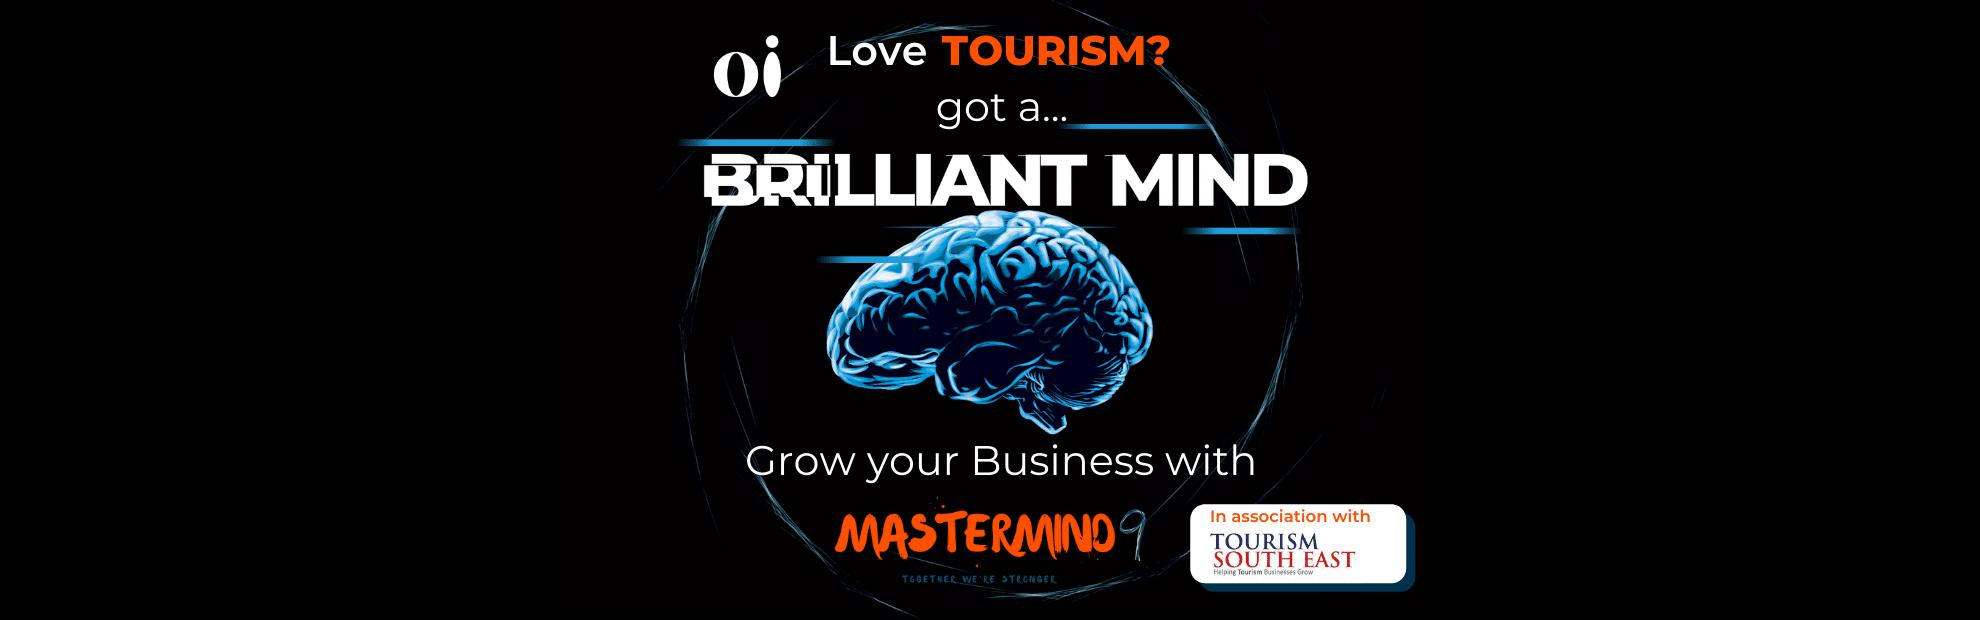 Tourism South East Mastermind Outside ideas Mastermind9